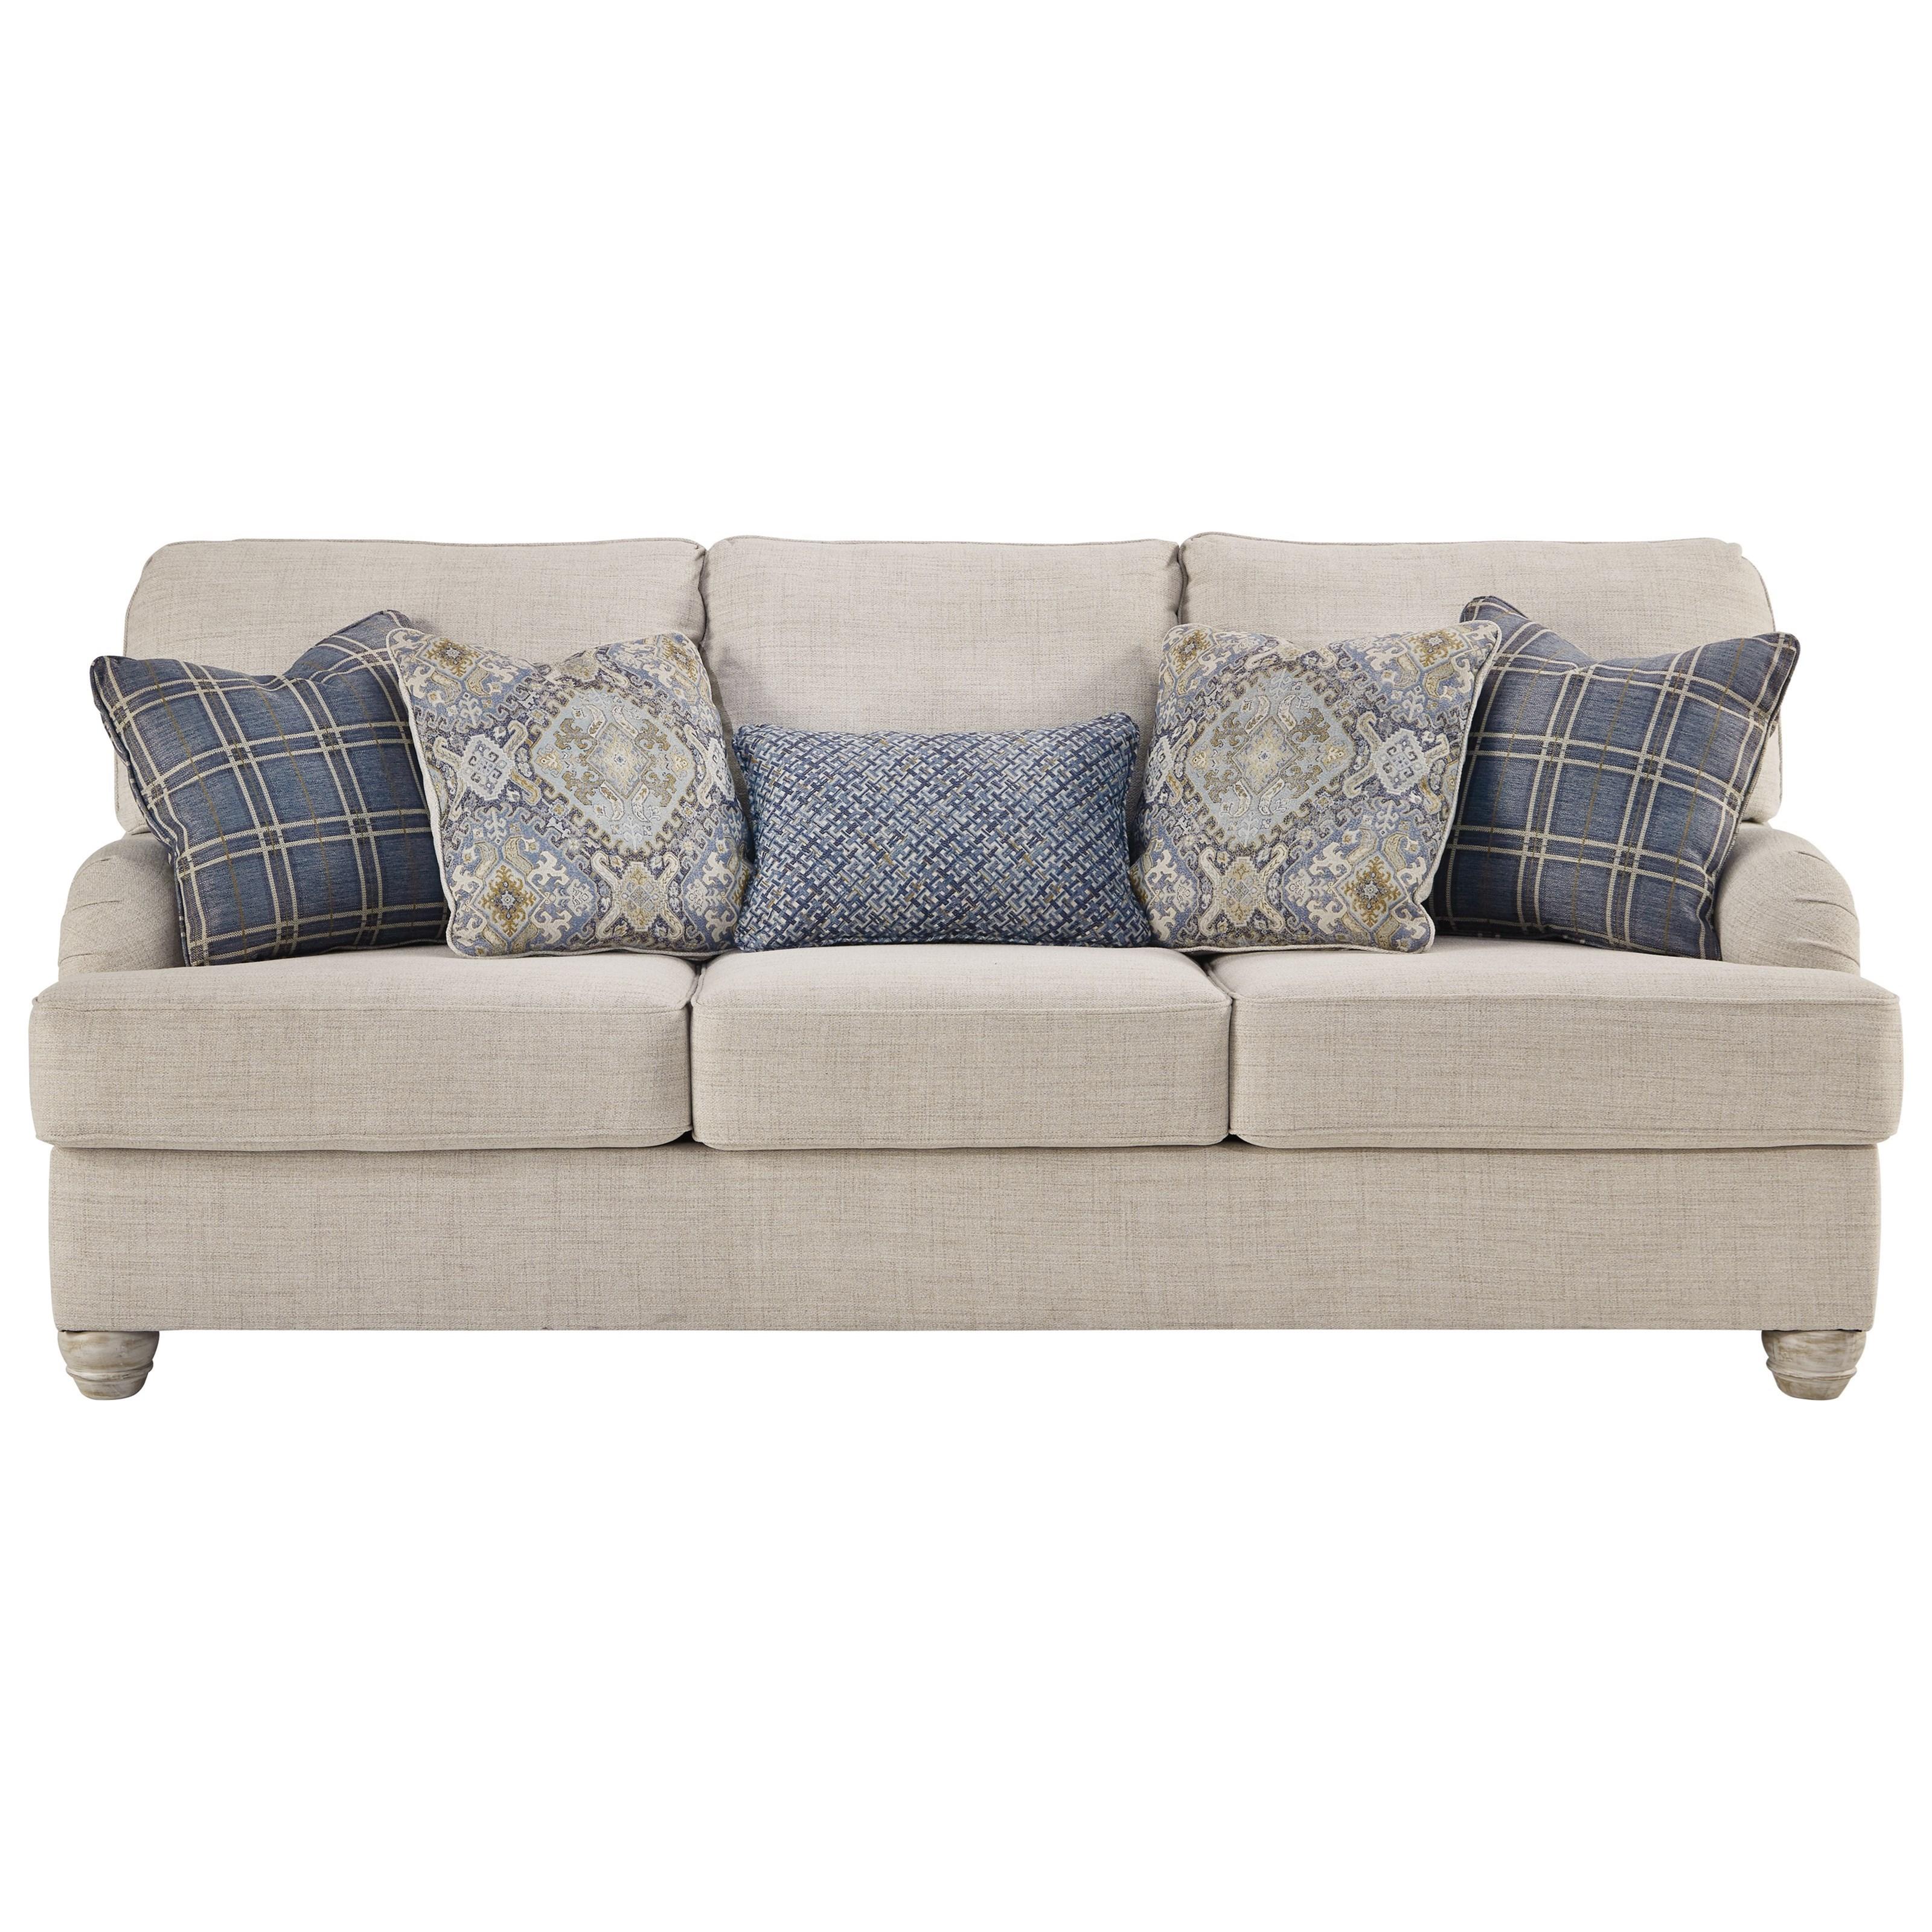 Twilla Queen Sofa Sleeper by Trendz at Ruby Gordon Home